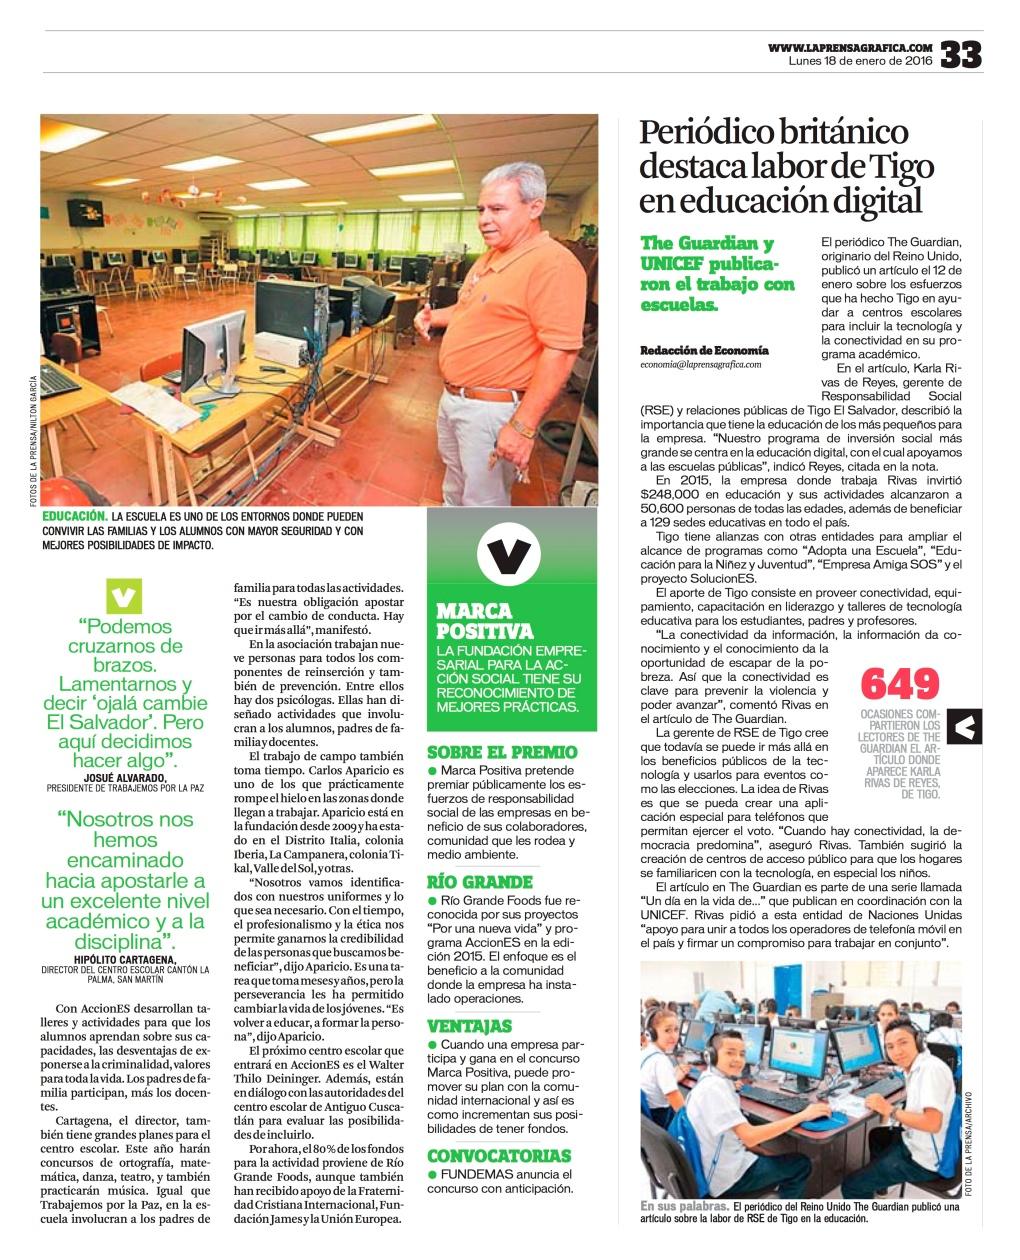 LPG20160118 - La Prensa Gráfica - PORTADA - pag 47